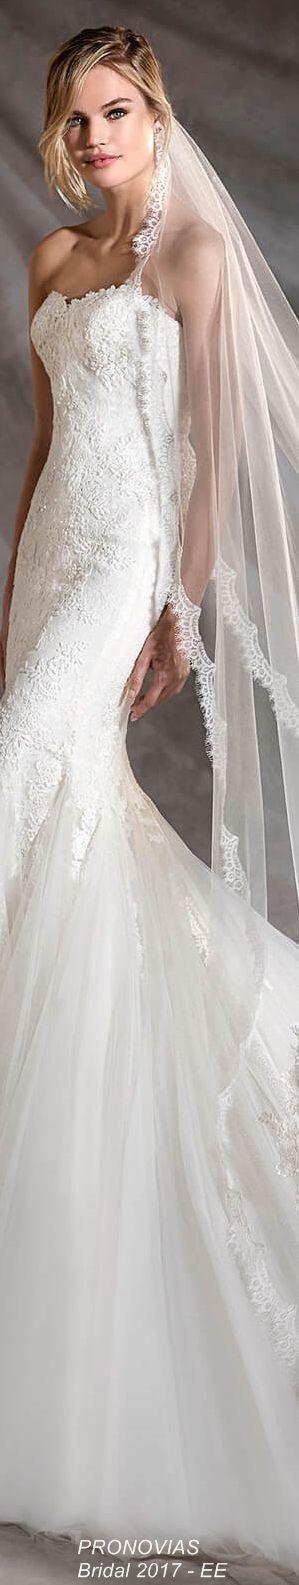 Свадьба - PRONOVIAS Bridal Collection 2017 - EE